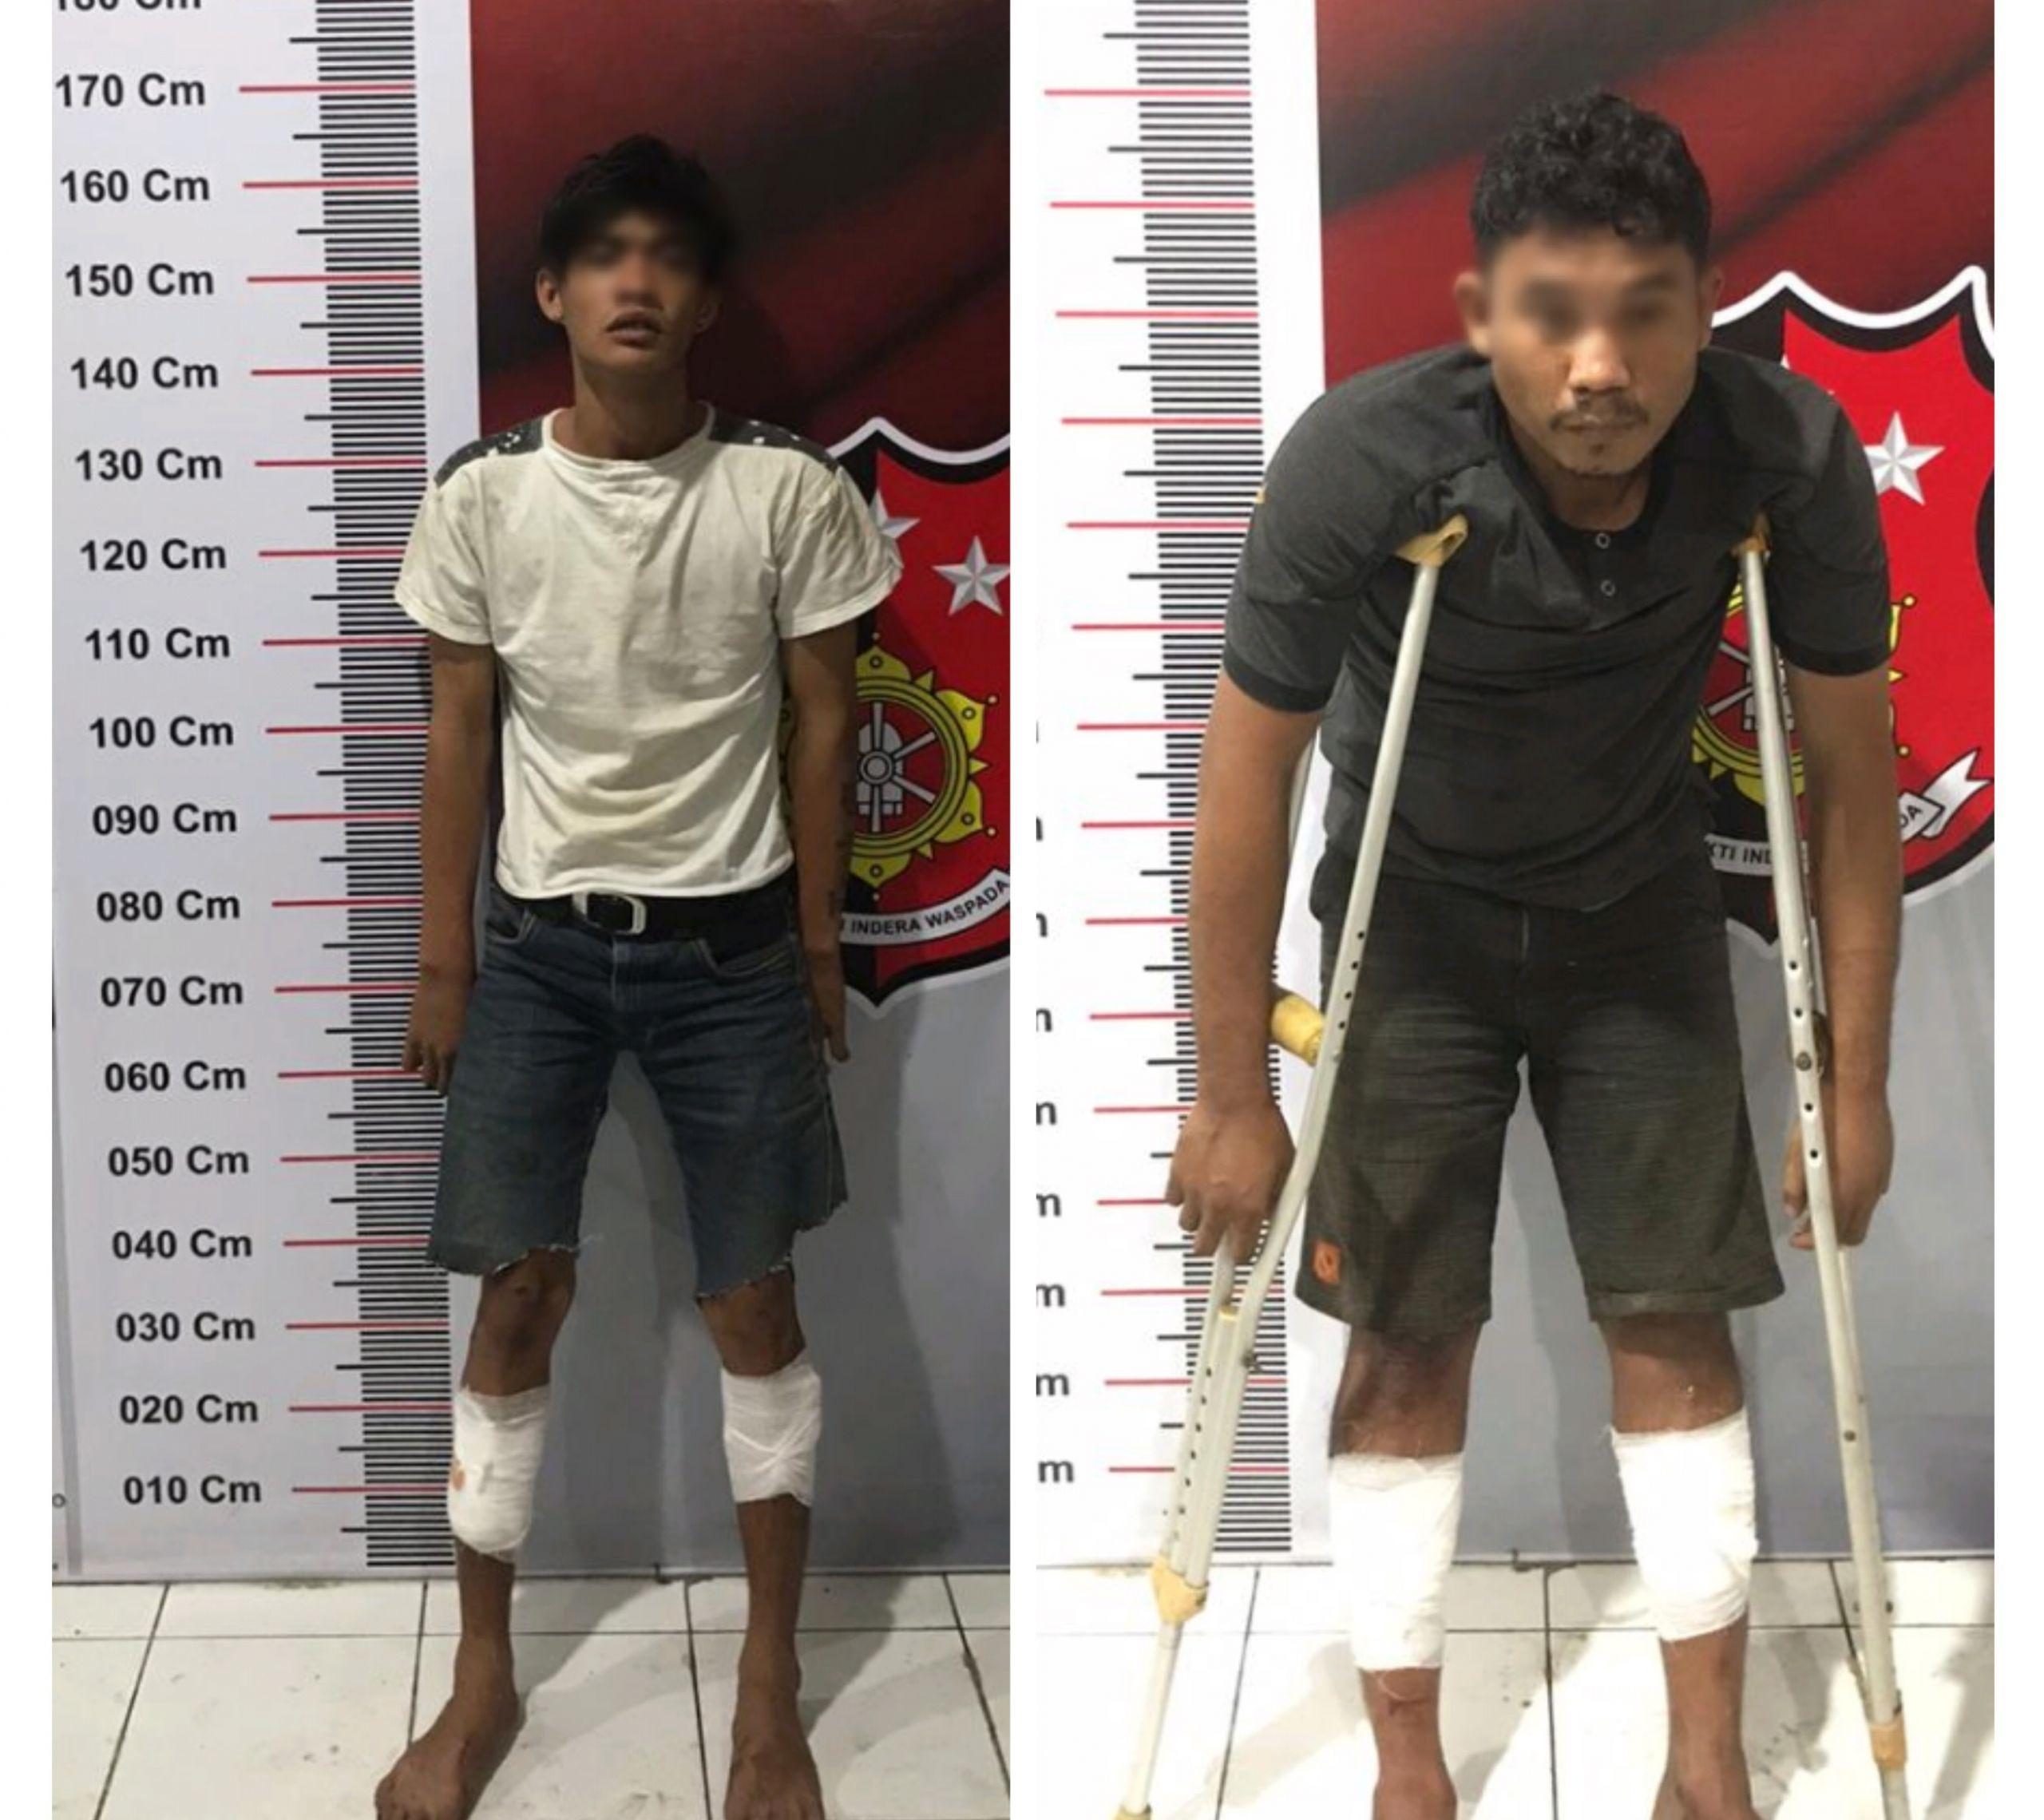 Curi Sepedamotor di Minimarket Johor, Eks Napi Asimilasi Ambruk Diterjang Timah Panas Polisi